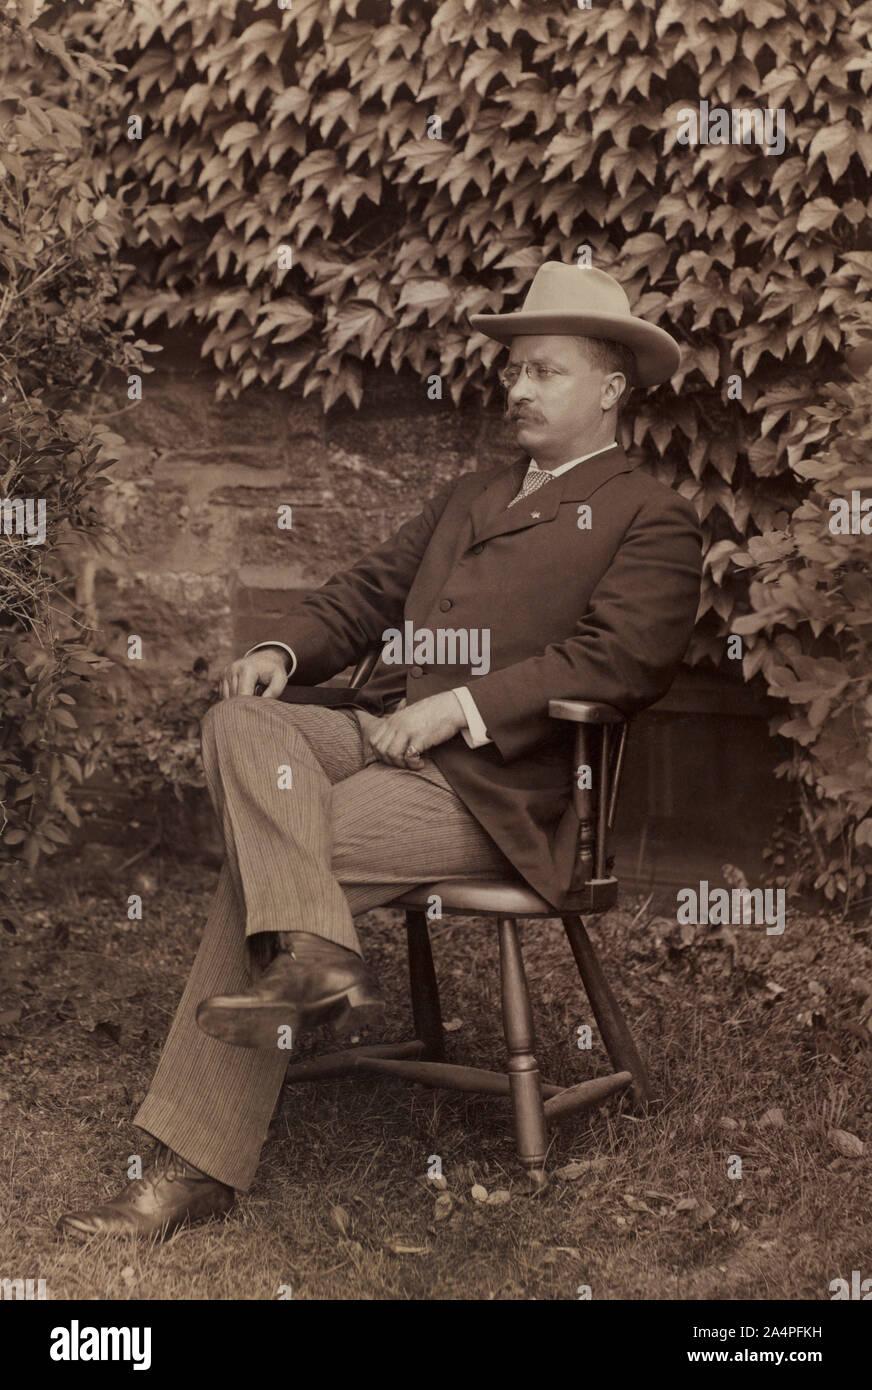 Theodore Roosevelt (1858-1919), 26º Presidente de los Estados Unidos, 1901-09 Full-Length asentado retrato como gobernador de Nueva York, agosto de 1900 Foto de stock